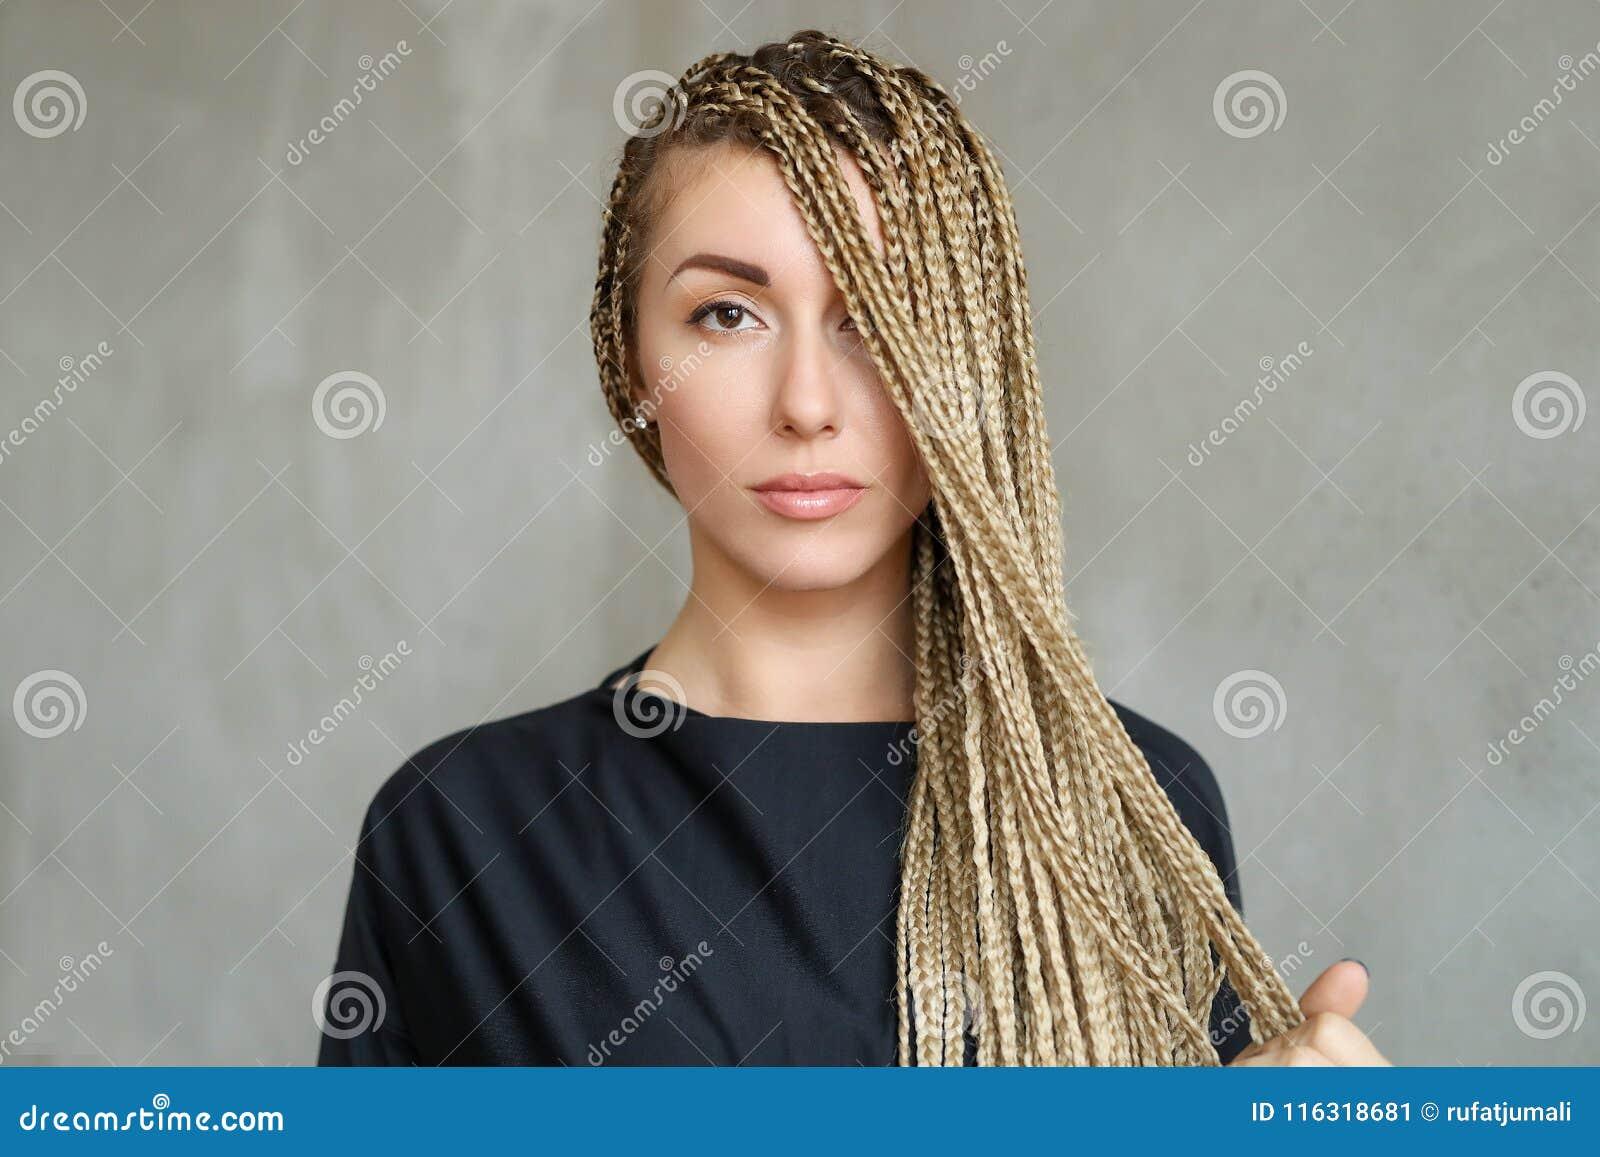 Woman With Dreadlocks Stock Image Image Of Teen Long 116318681